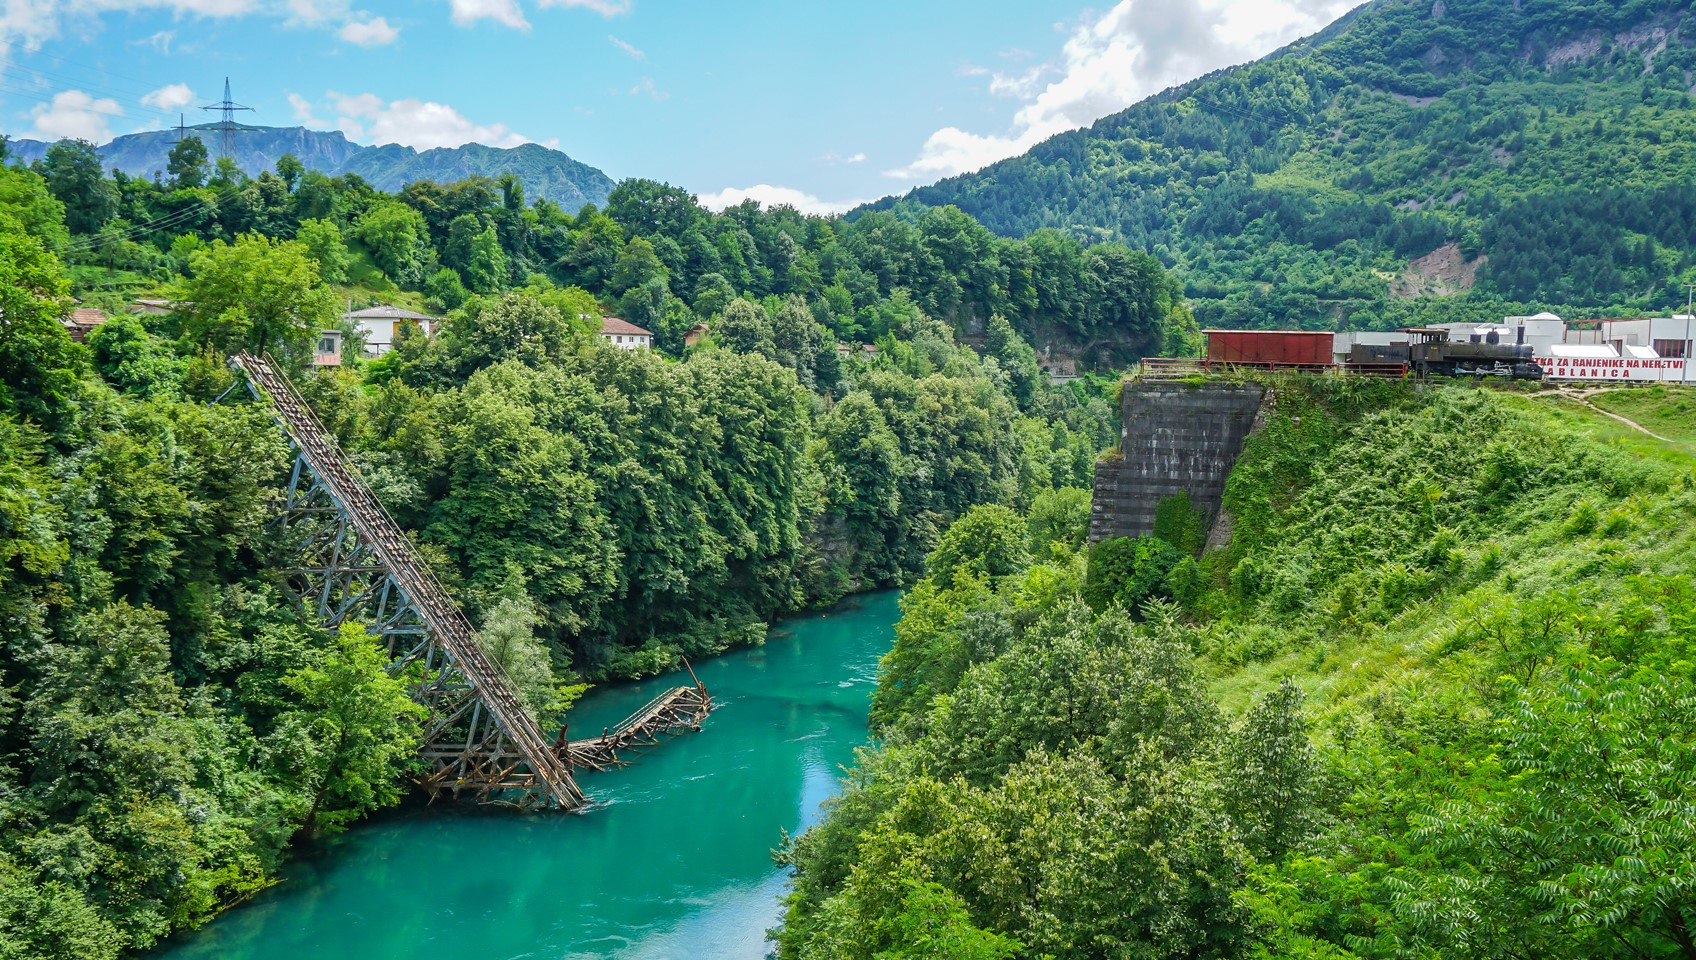 Jablanica destroyed railway bridge